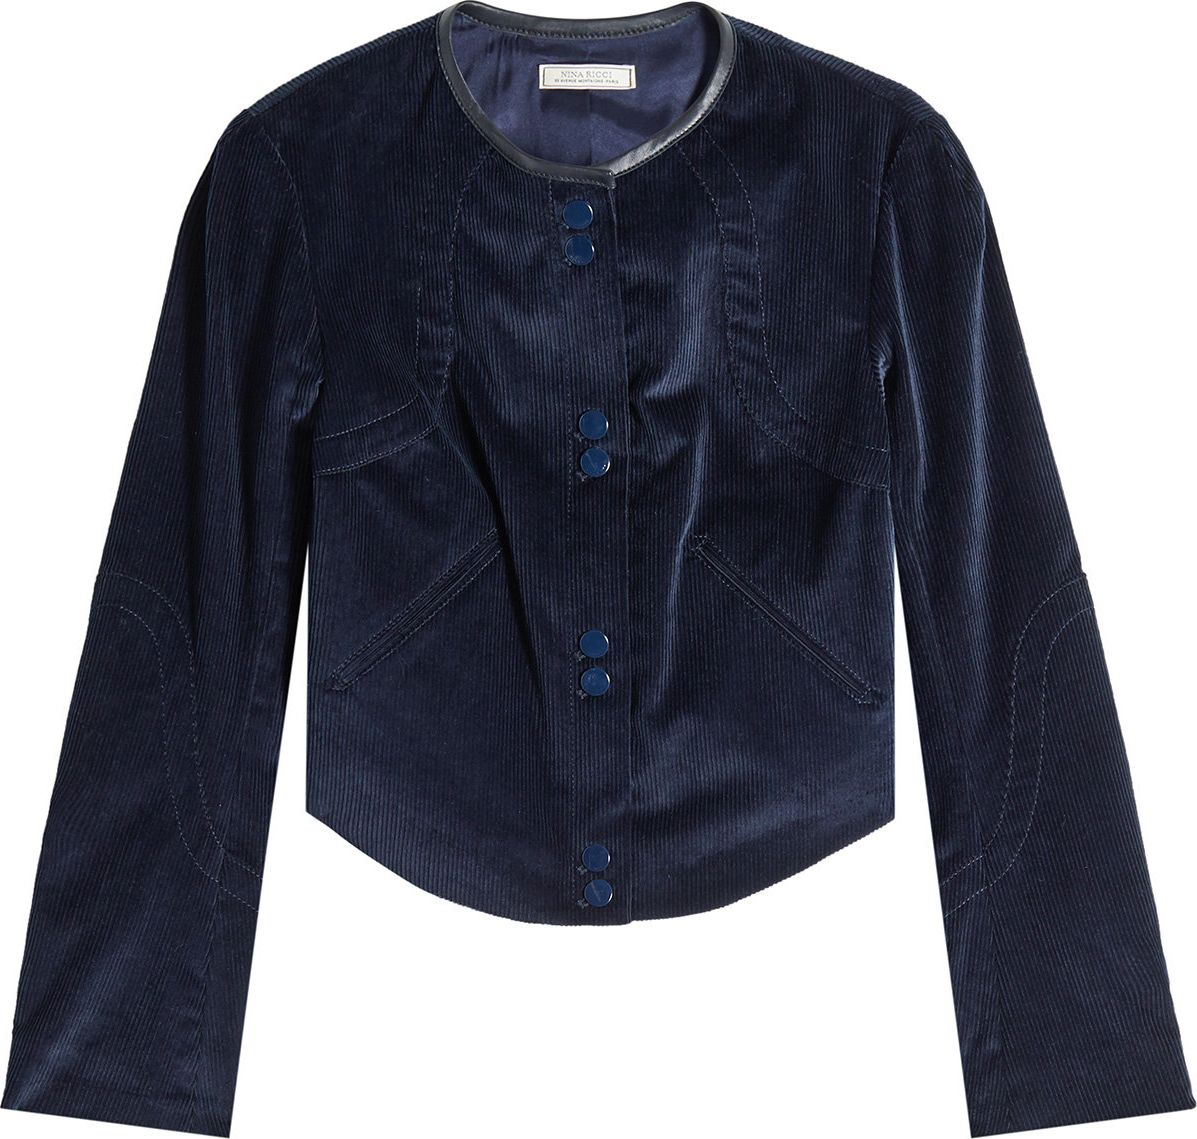 Nina Ricci - Corduroy Jacket with Leather Trim